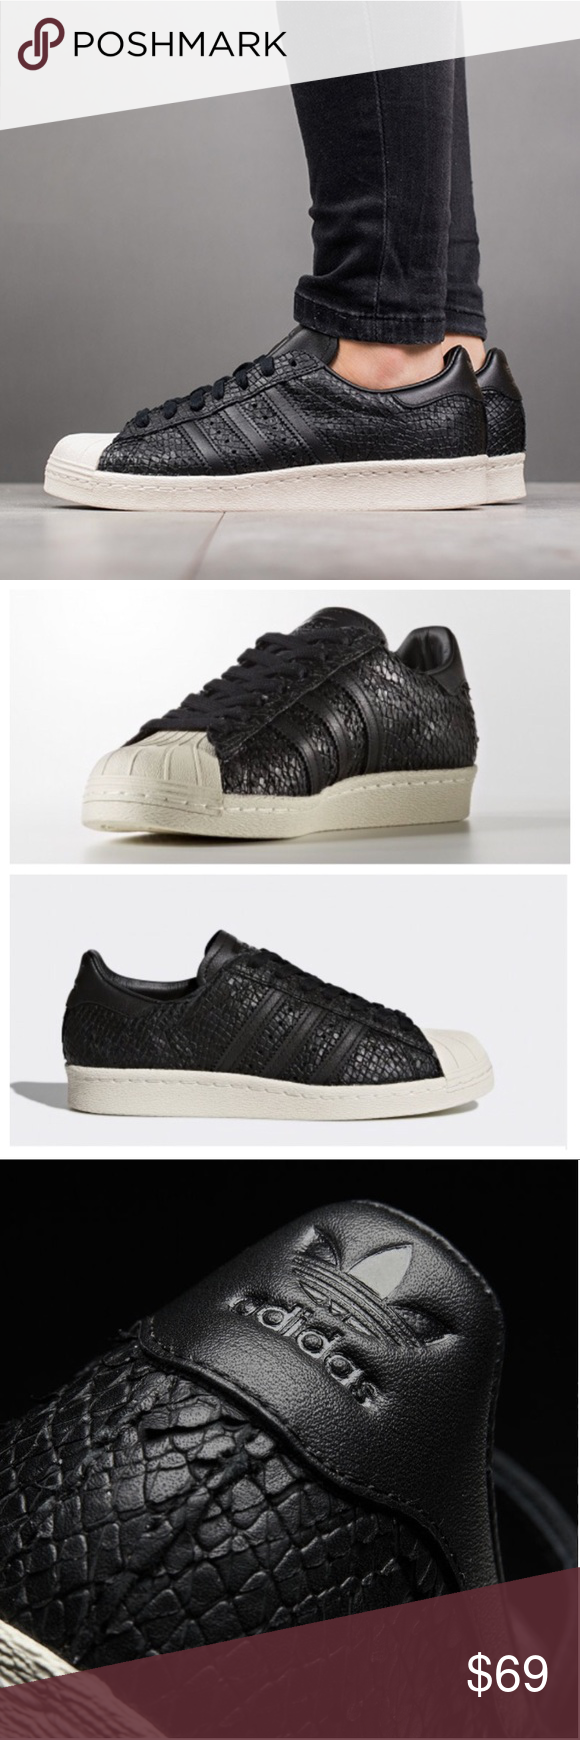 Adidas superstar, Snake leather